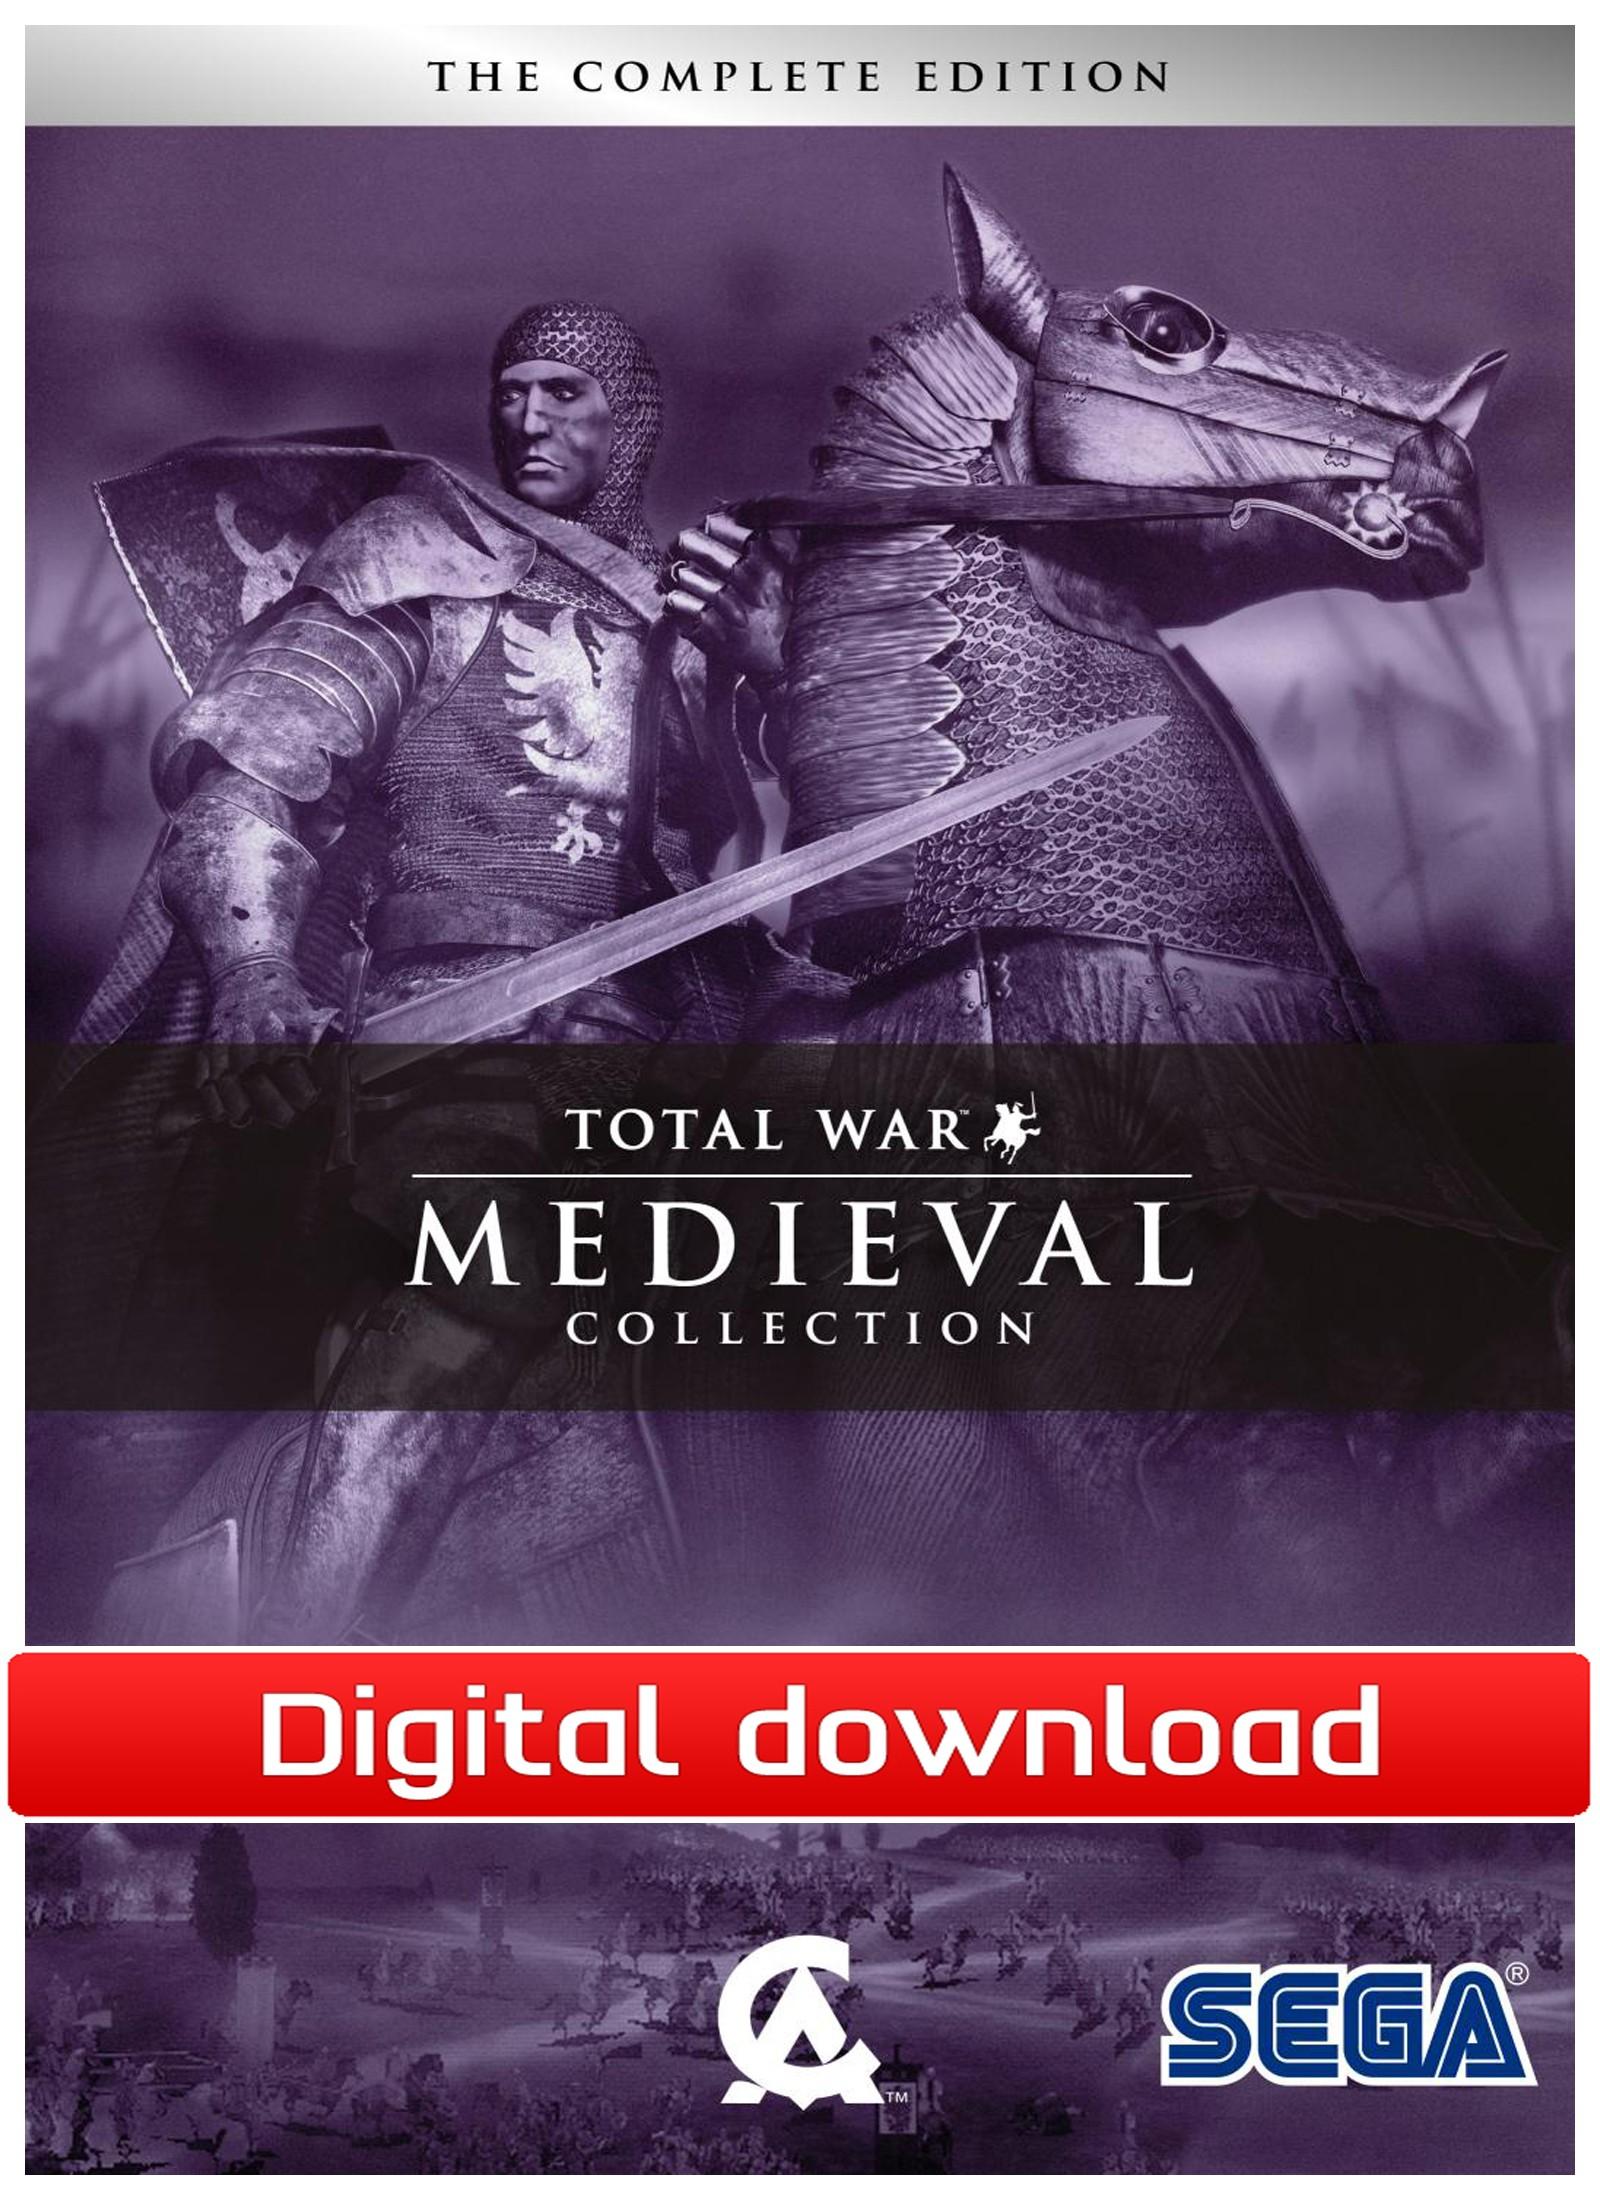 37319 : Medieval: Total War Collection (PC nedlastning)